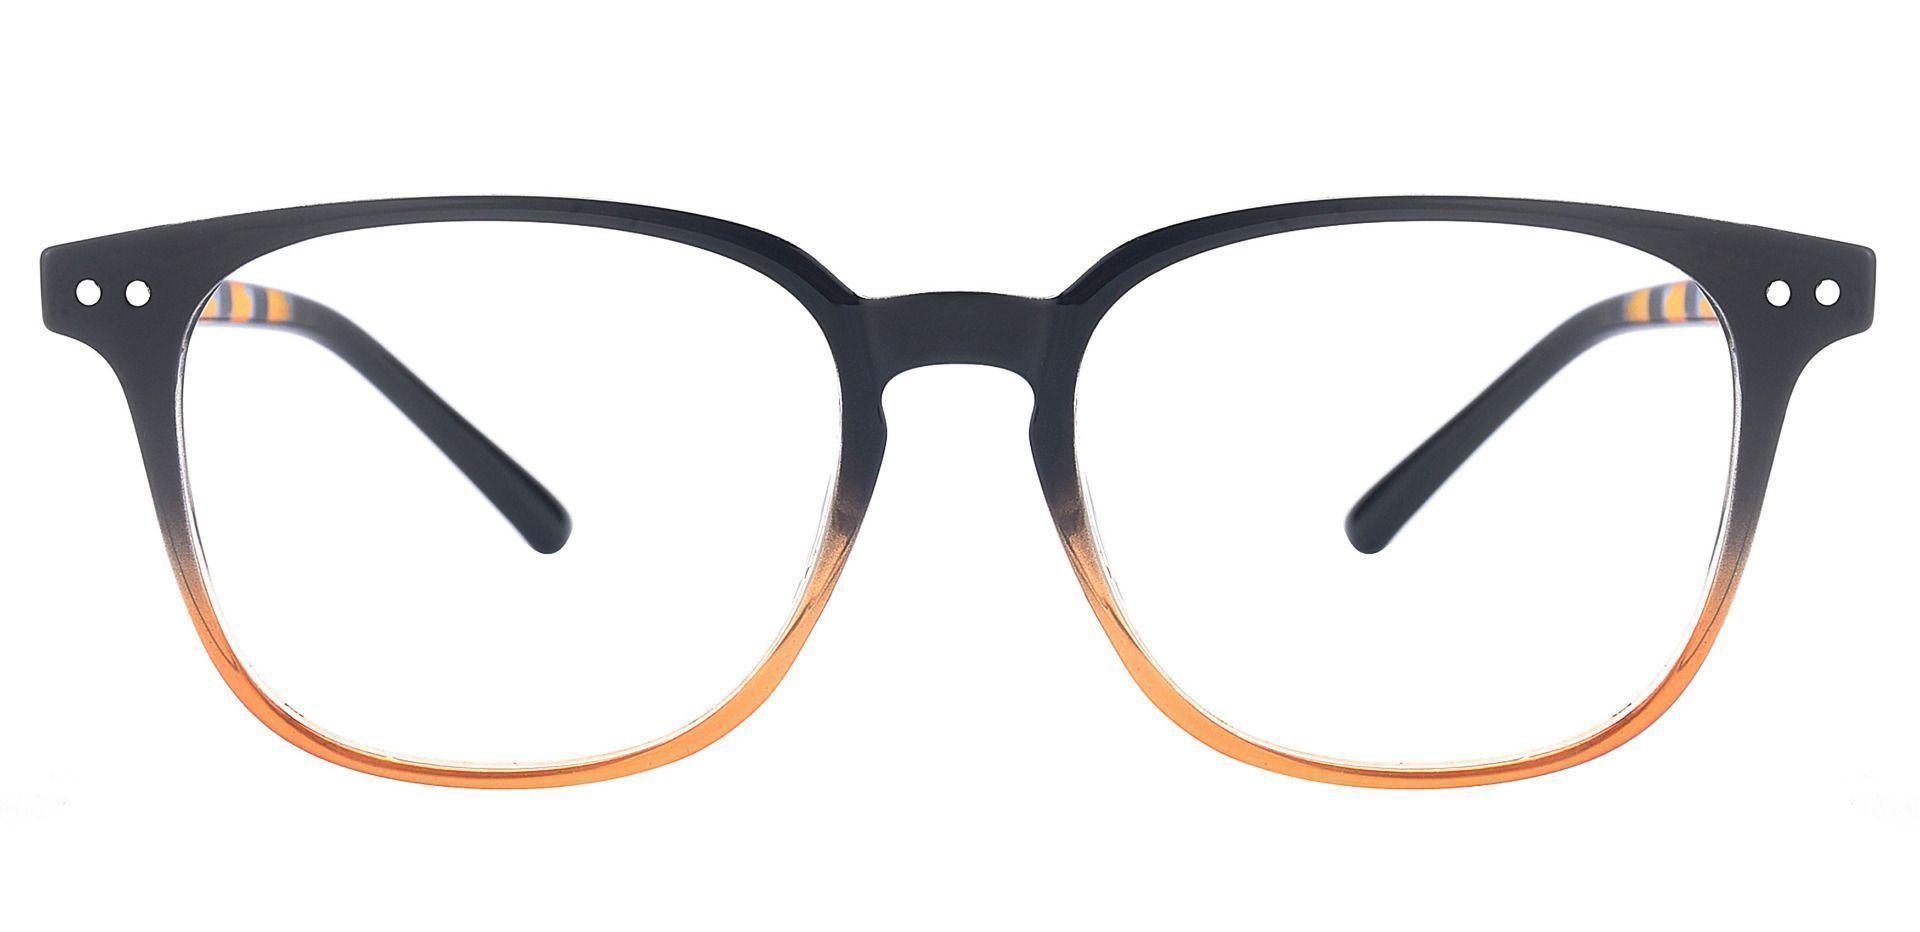 Ravine Oval Prescription Glasses - The Frame Is Tortoise And Black